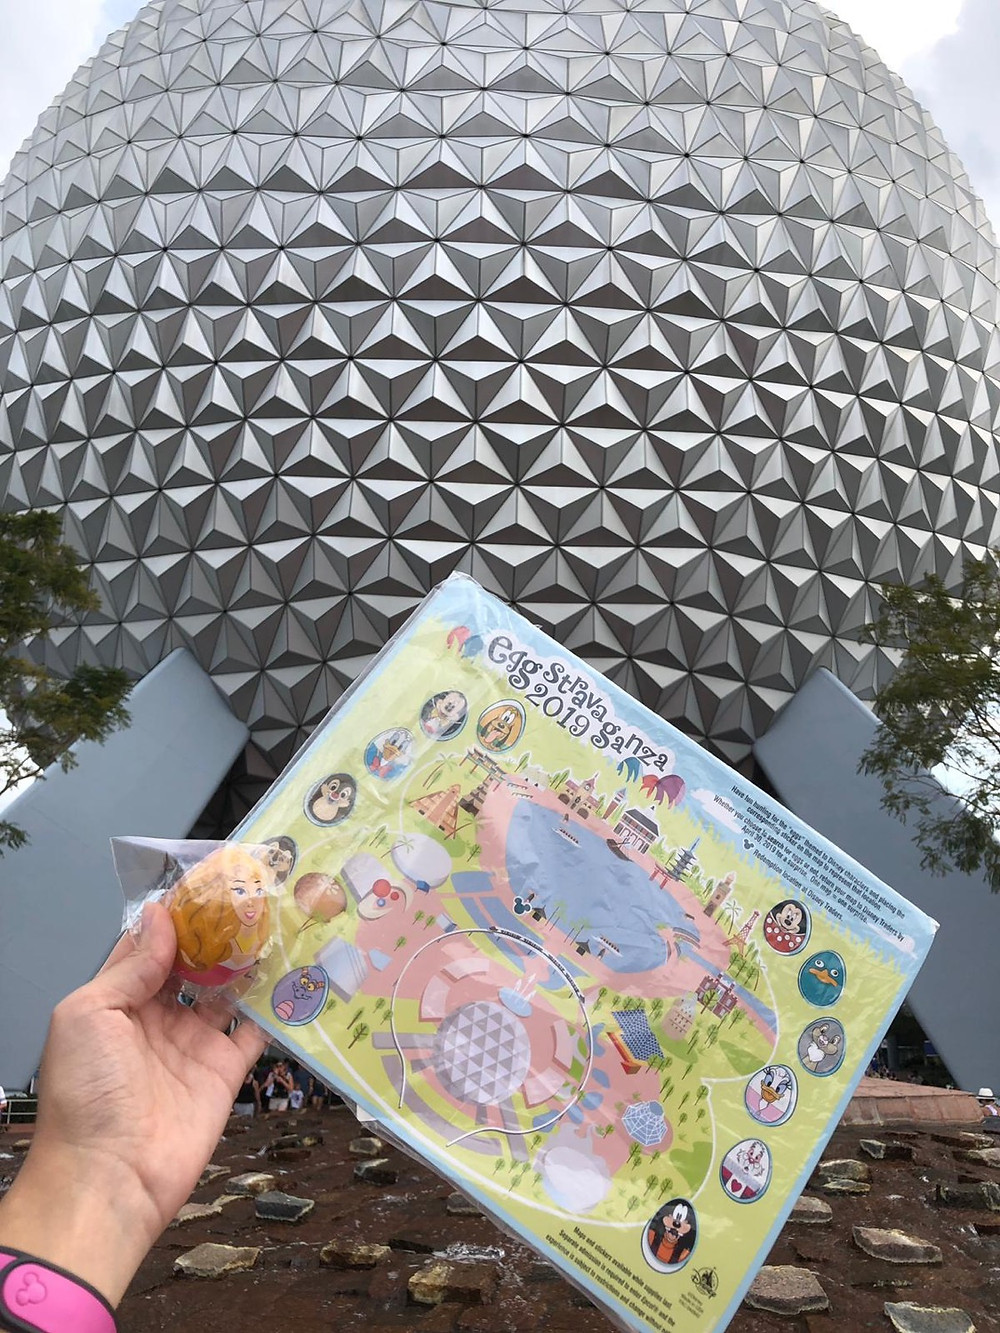 Eggstravaganza Epcot Flower and Garden Festival 2019 - Imagem Revista Orlando Wish